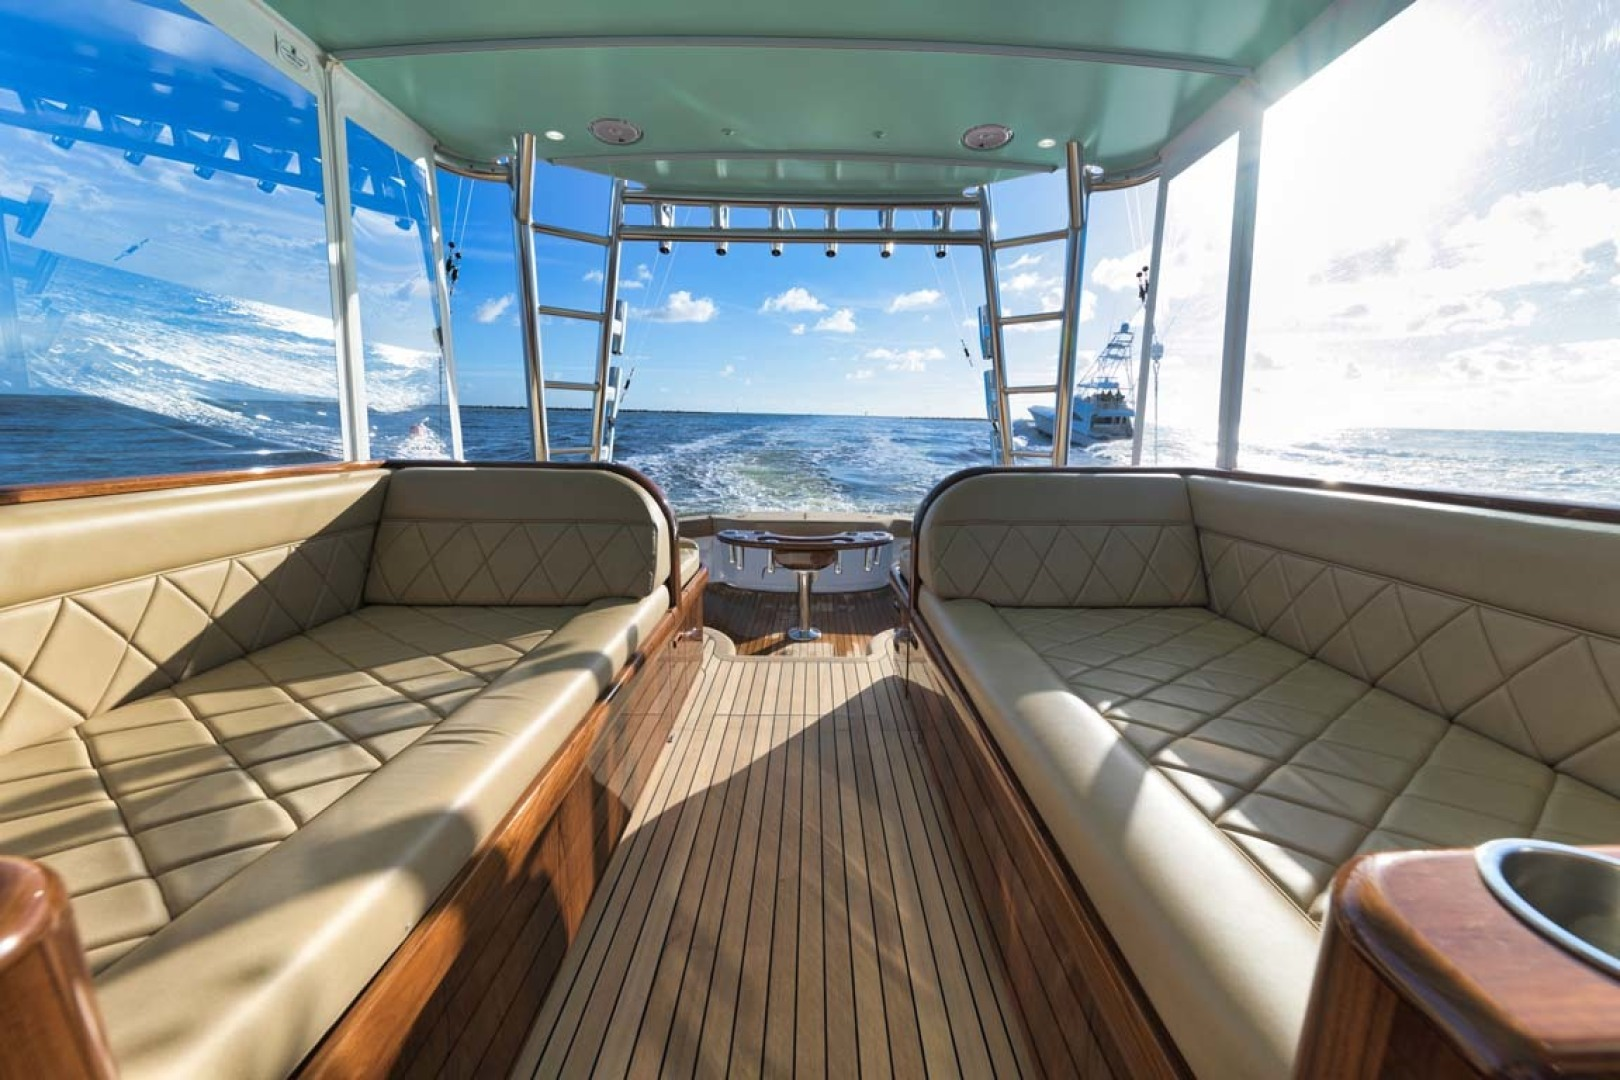 Winter Custom Yachts-46 Walkaround 2019-Family Circus Stuart-Florida-United States-Diamond Stitched Ultra-Leather Upholstery and Storage Below-1563760 | Thumbnail